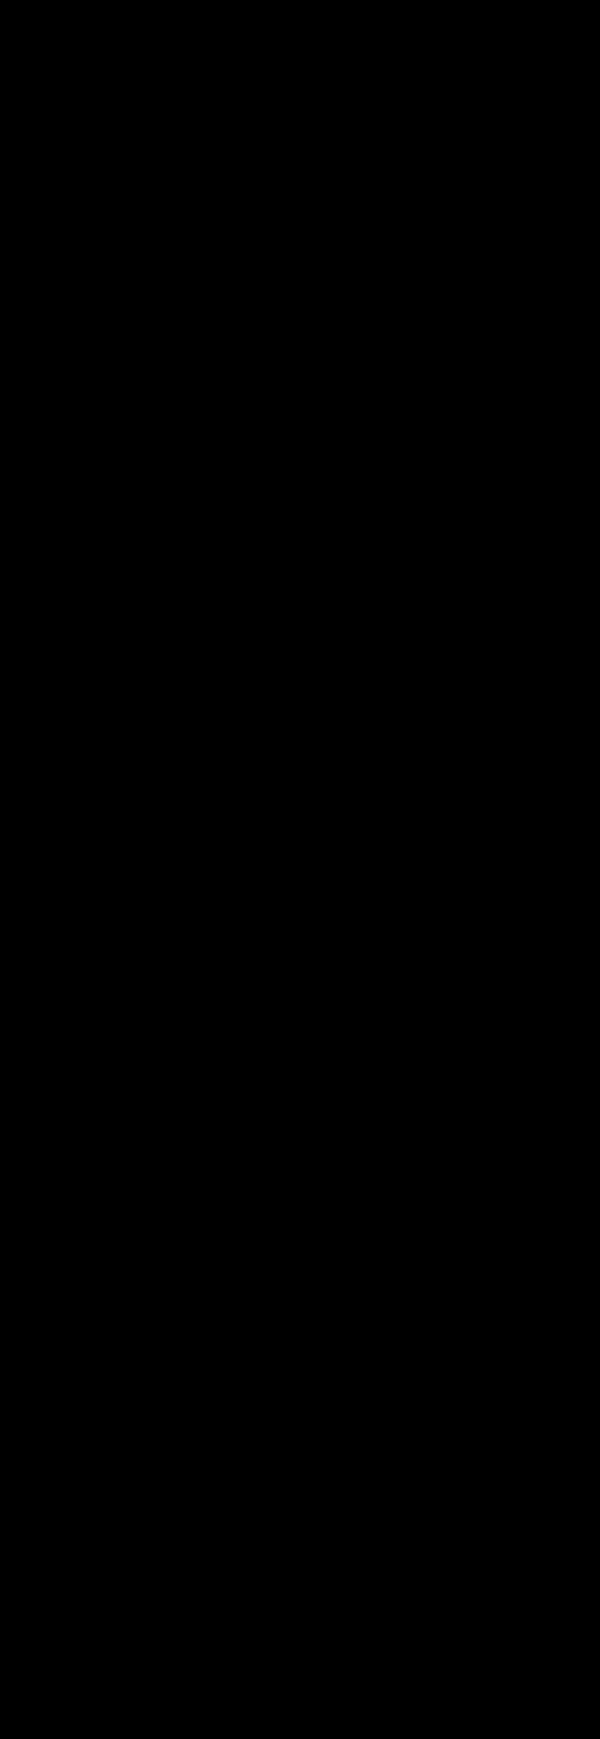 600x1739 Stick Figure Silhouette Clip Art